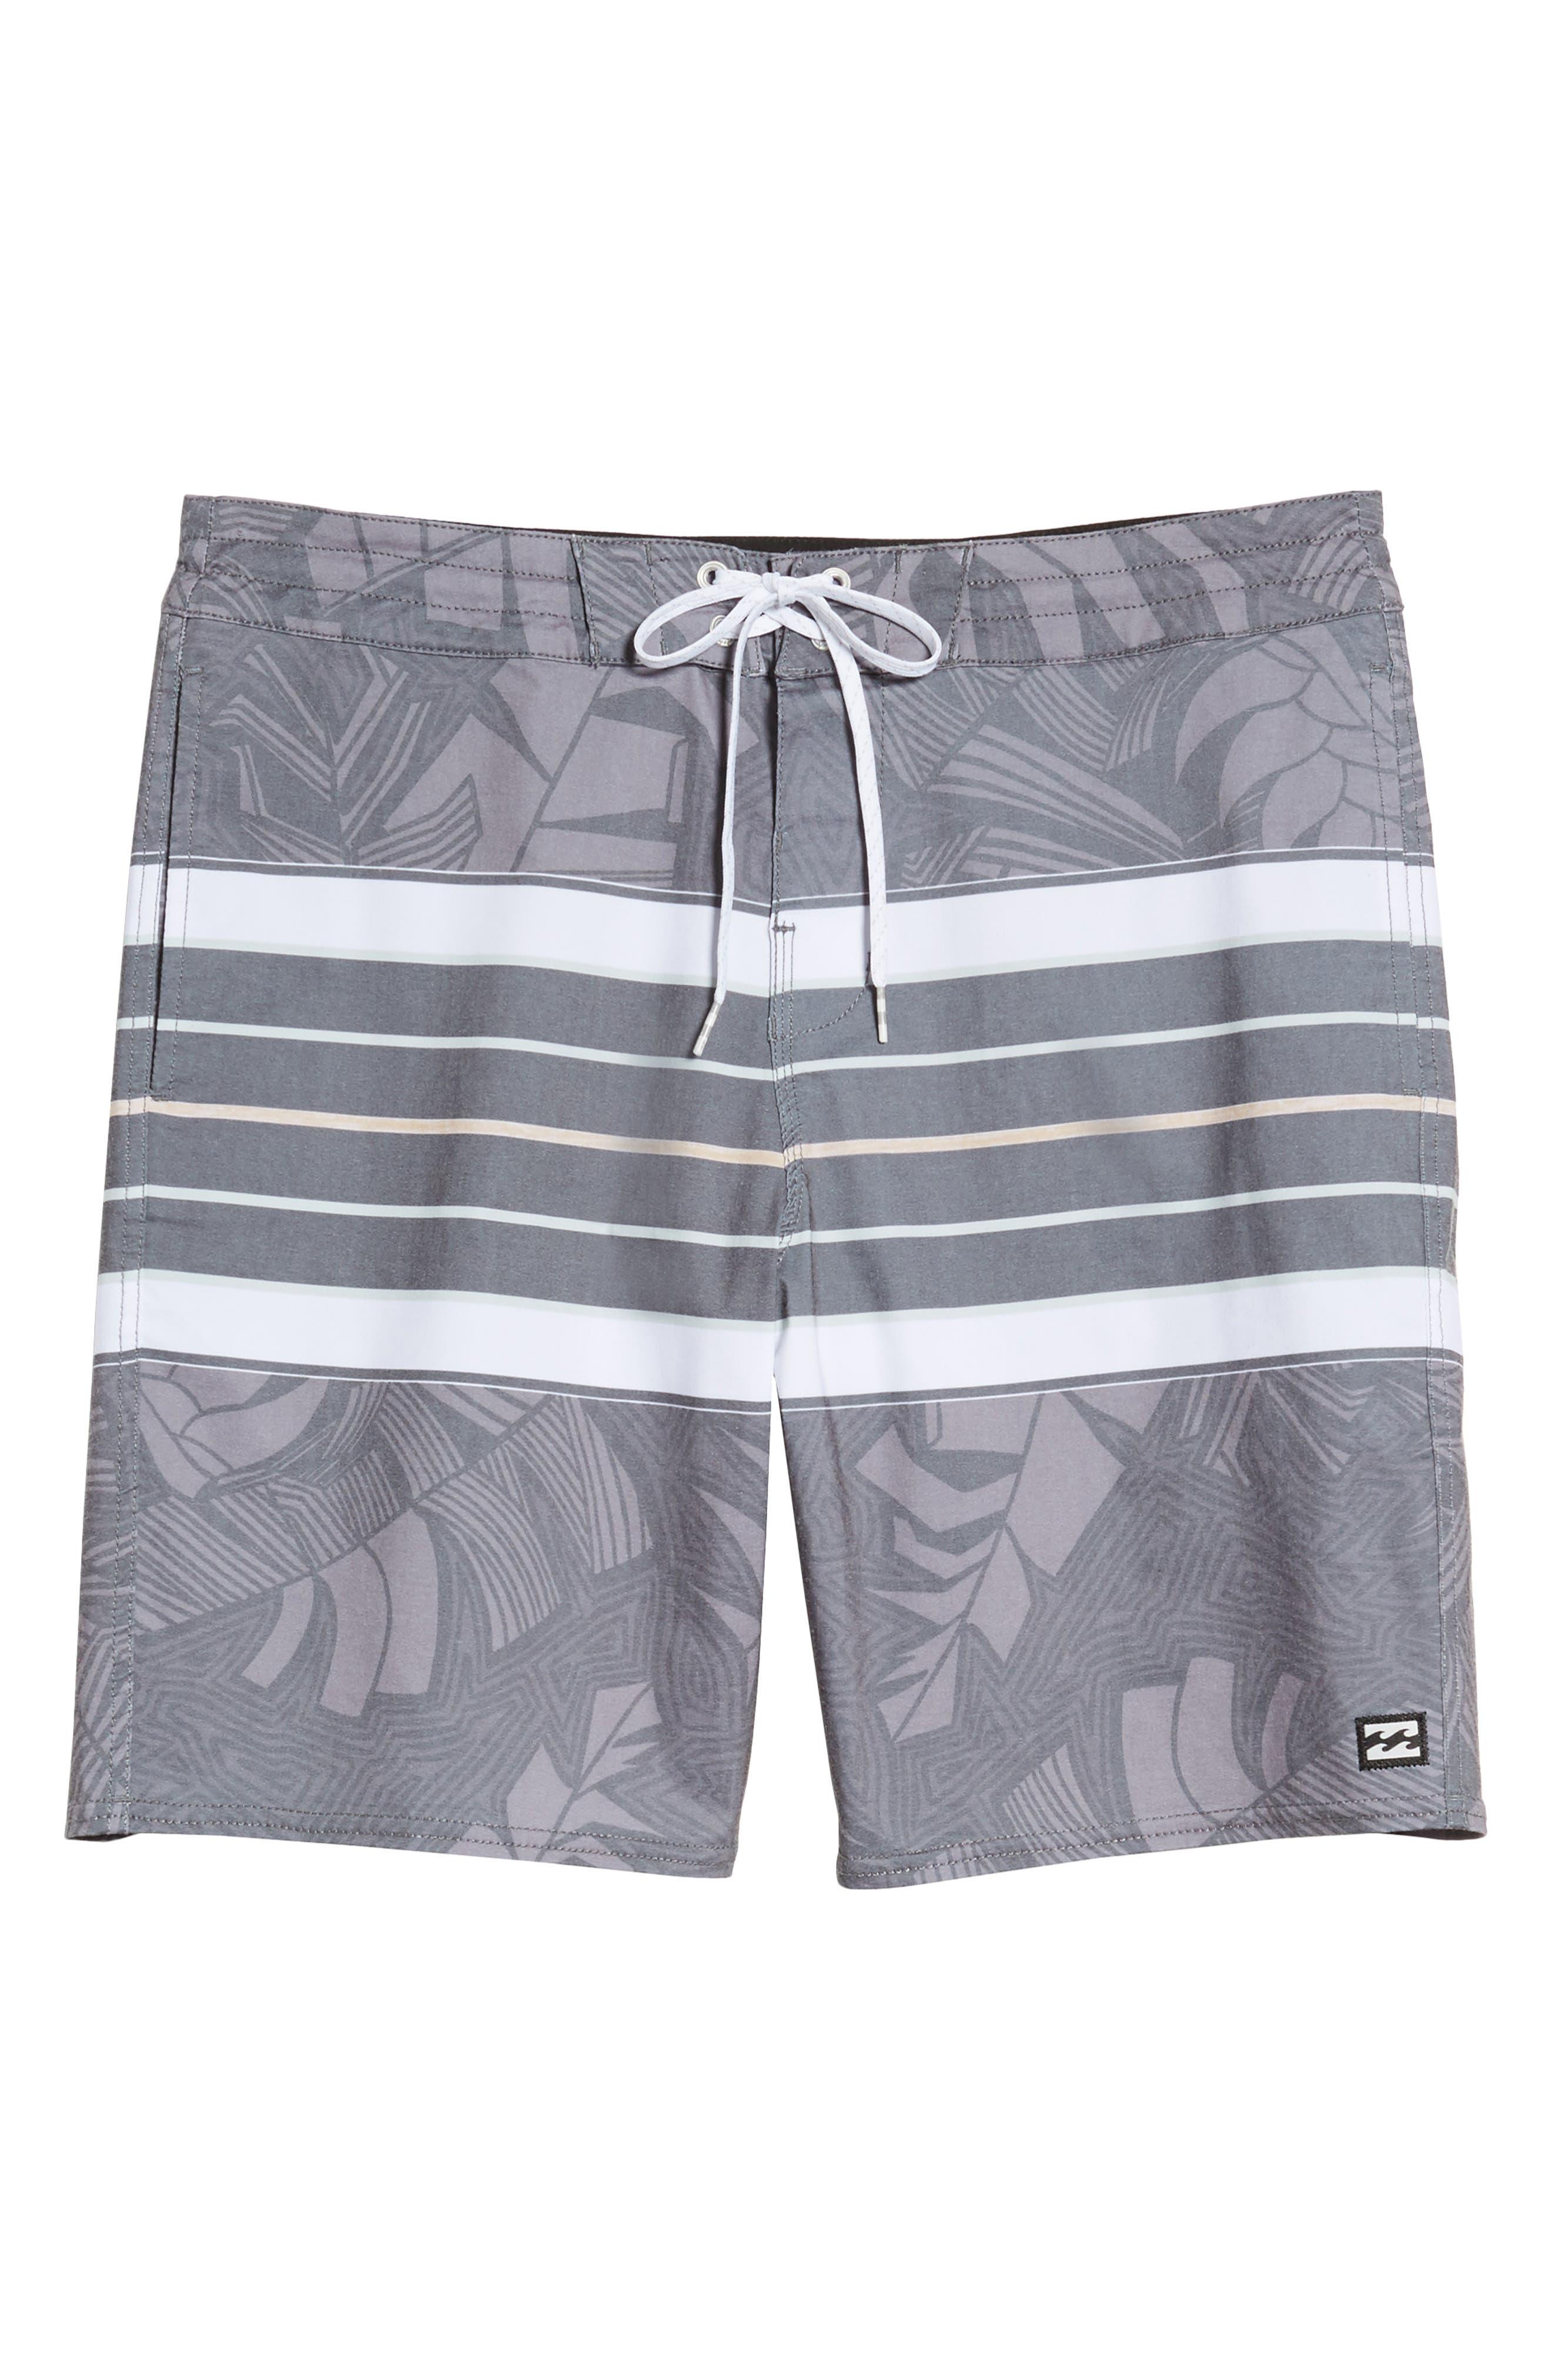 Stringer Lo Tides Board Shorts,                             Alternate thumbnail 6, color,                             001